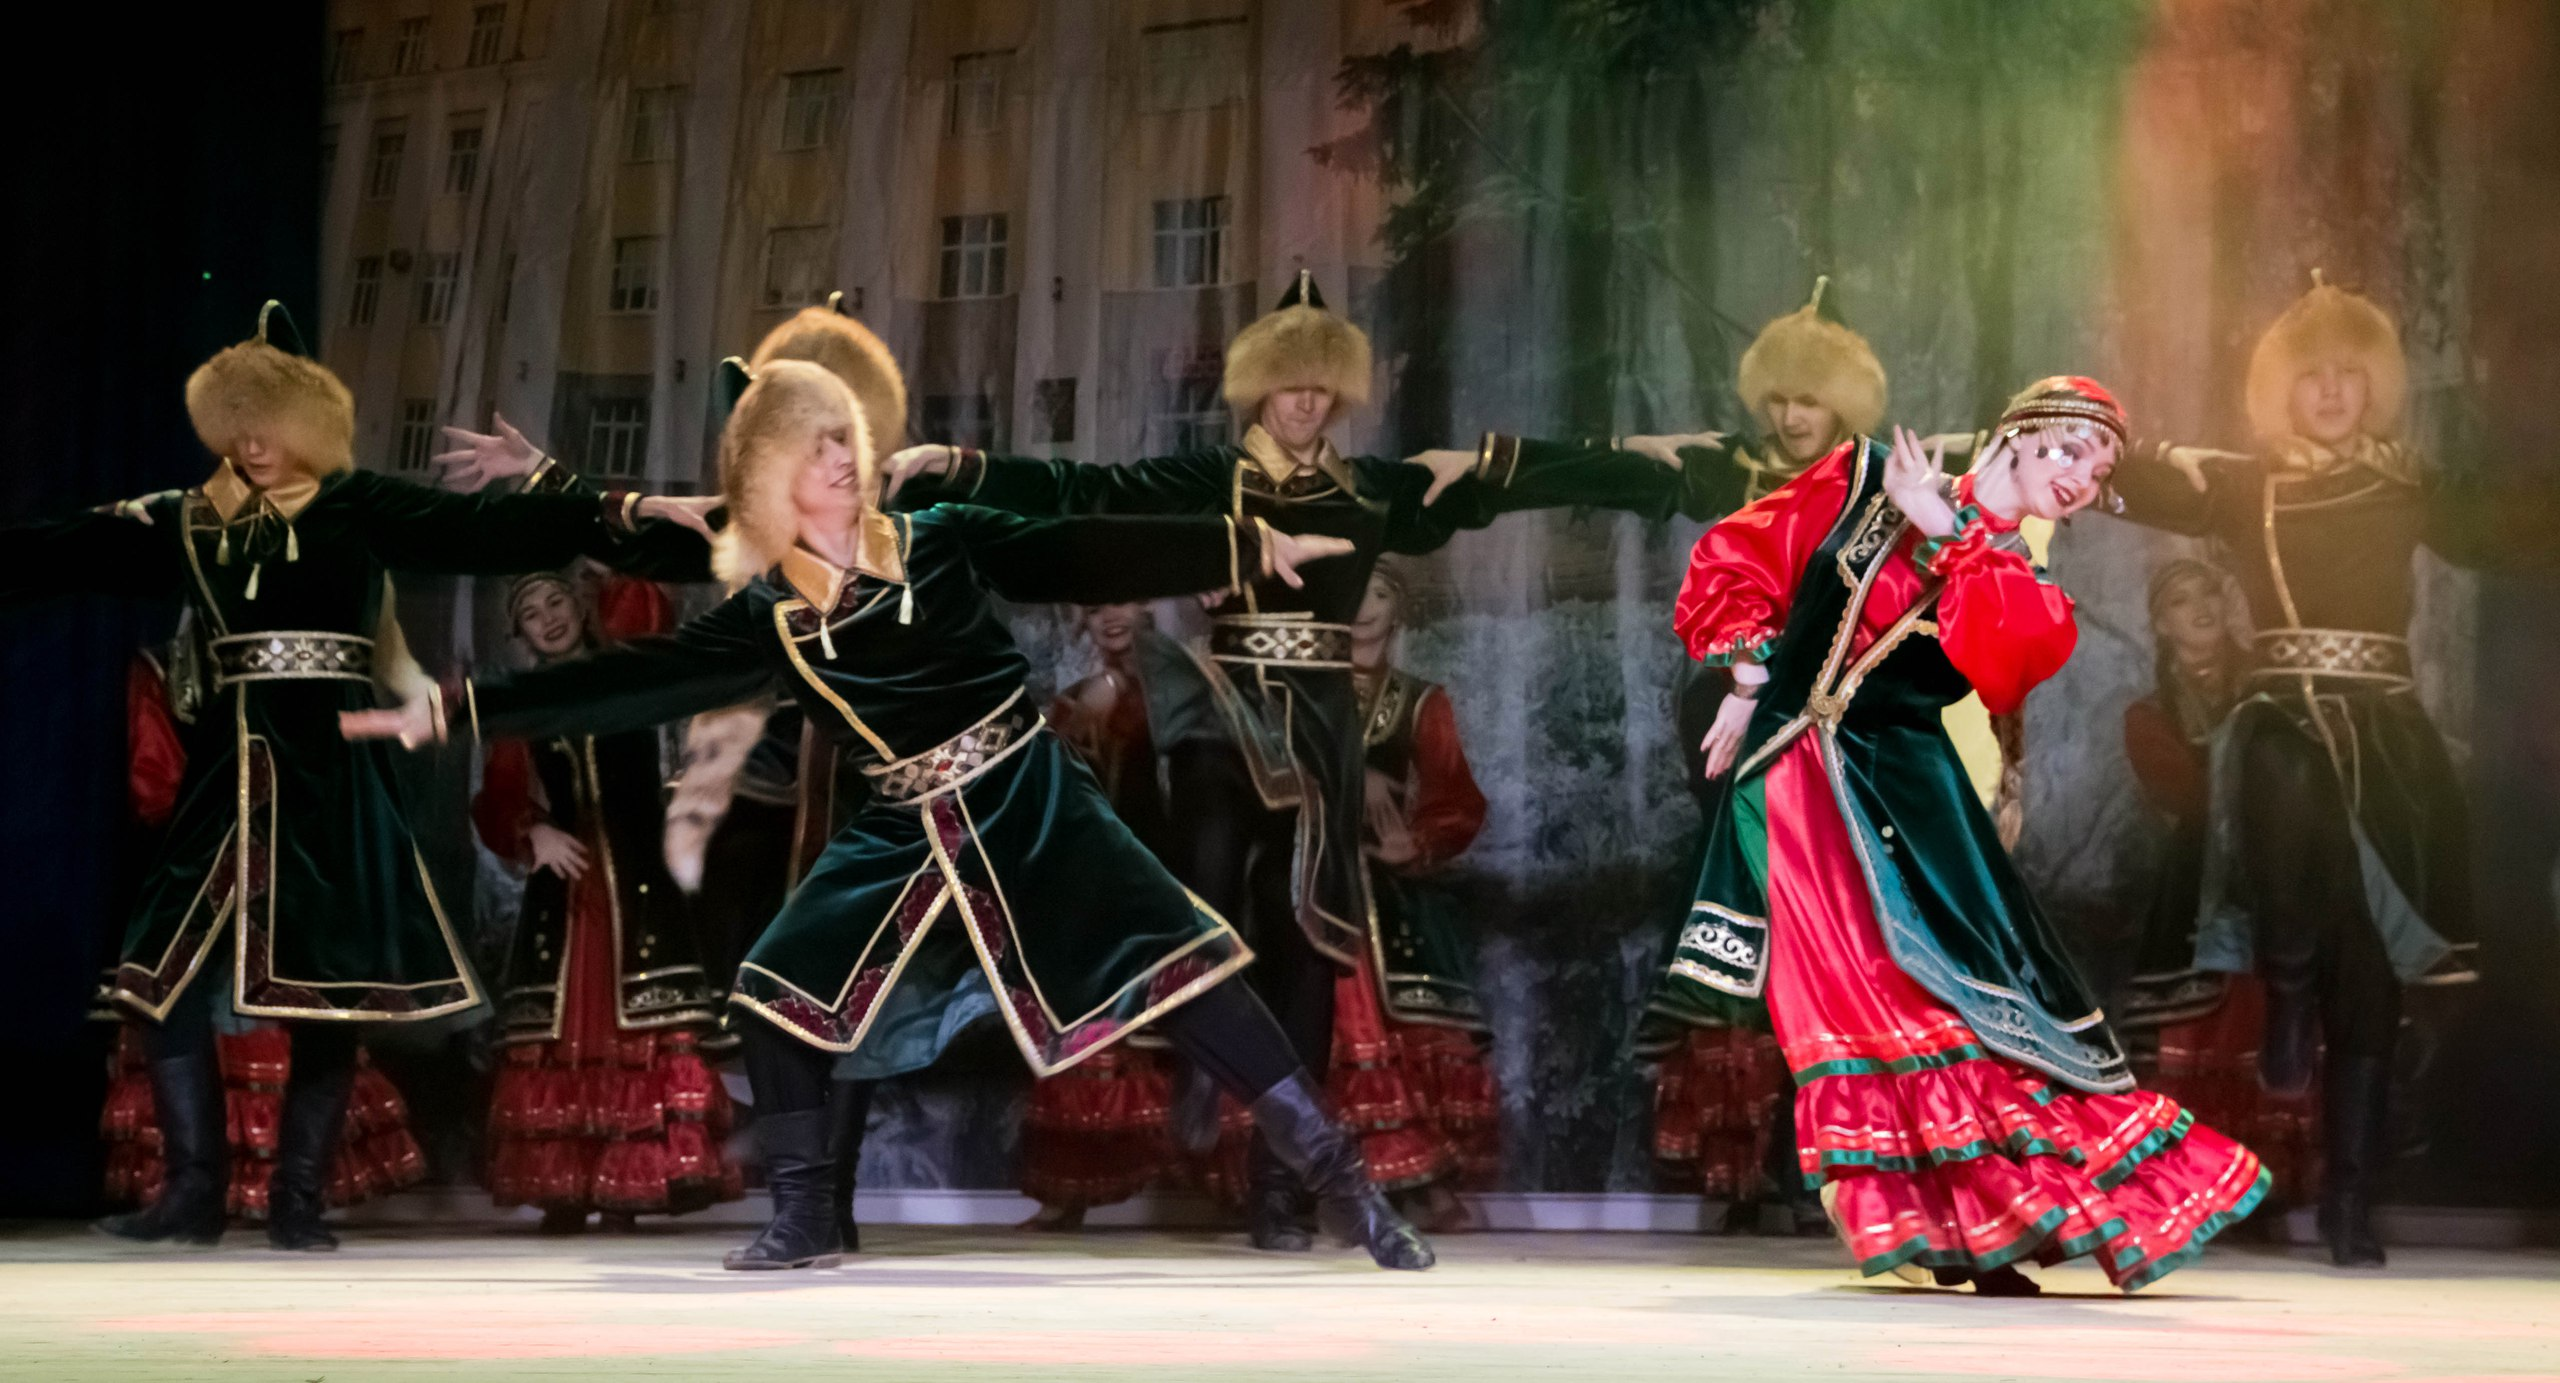 Festival mondial de Folklore de Jambes-Namur